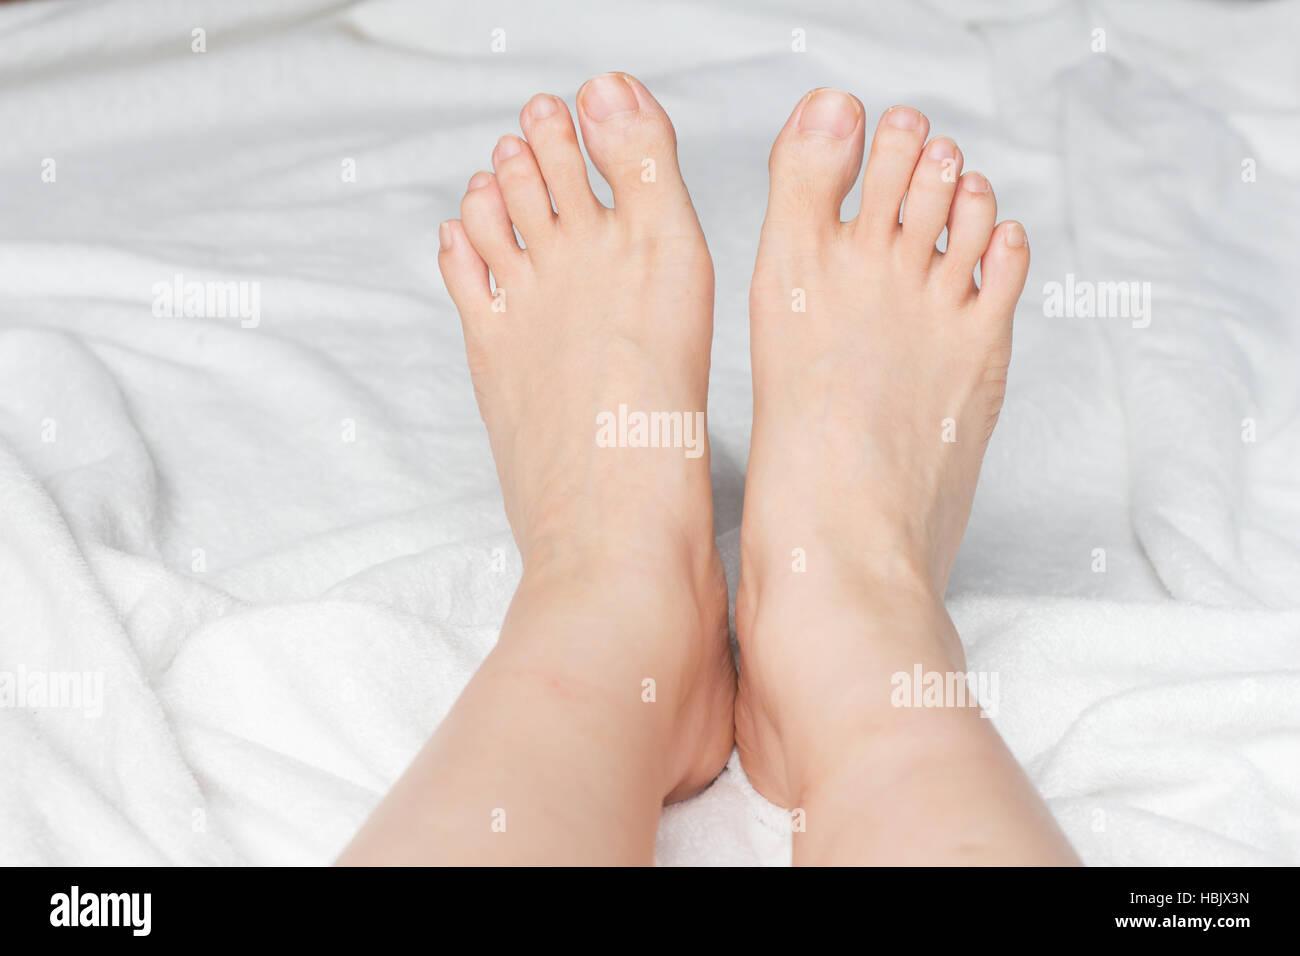 pics-of-asian-womans-feet-hot-pron-afgansitan